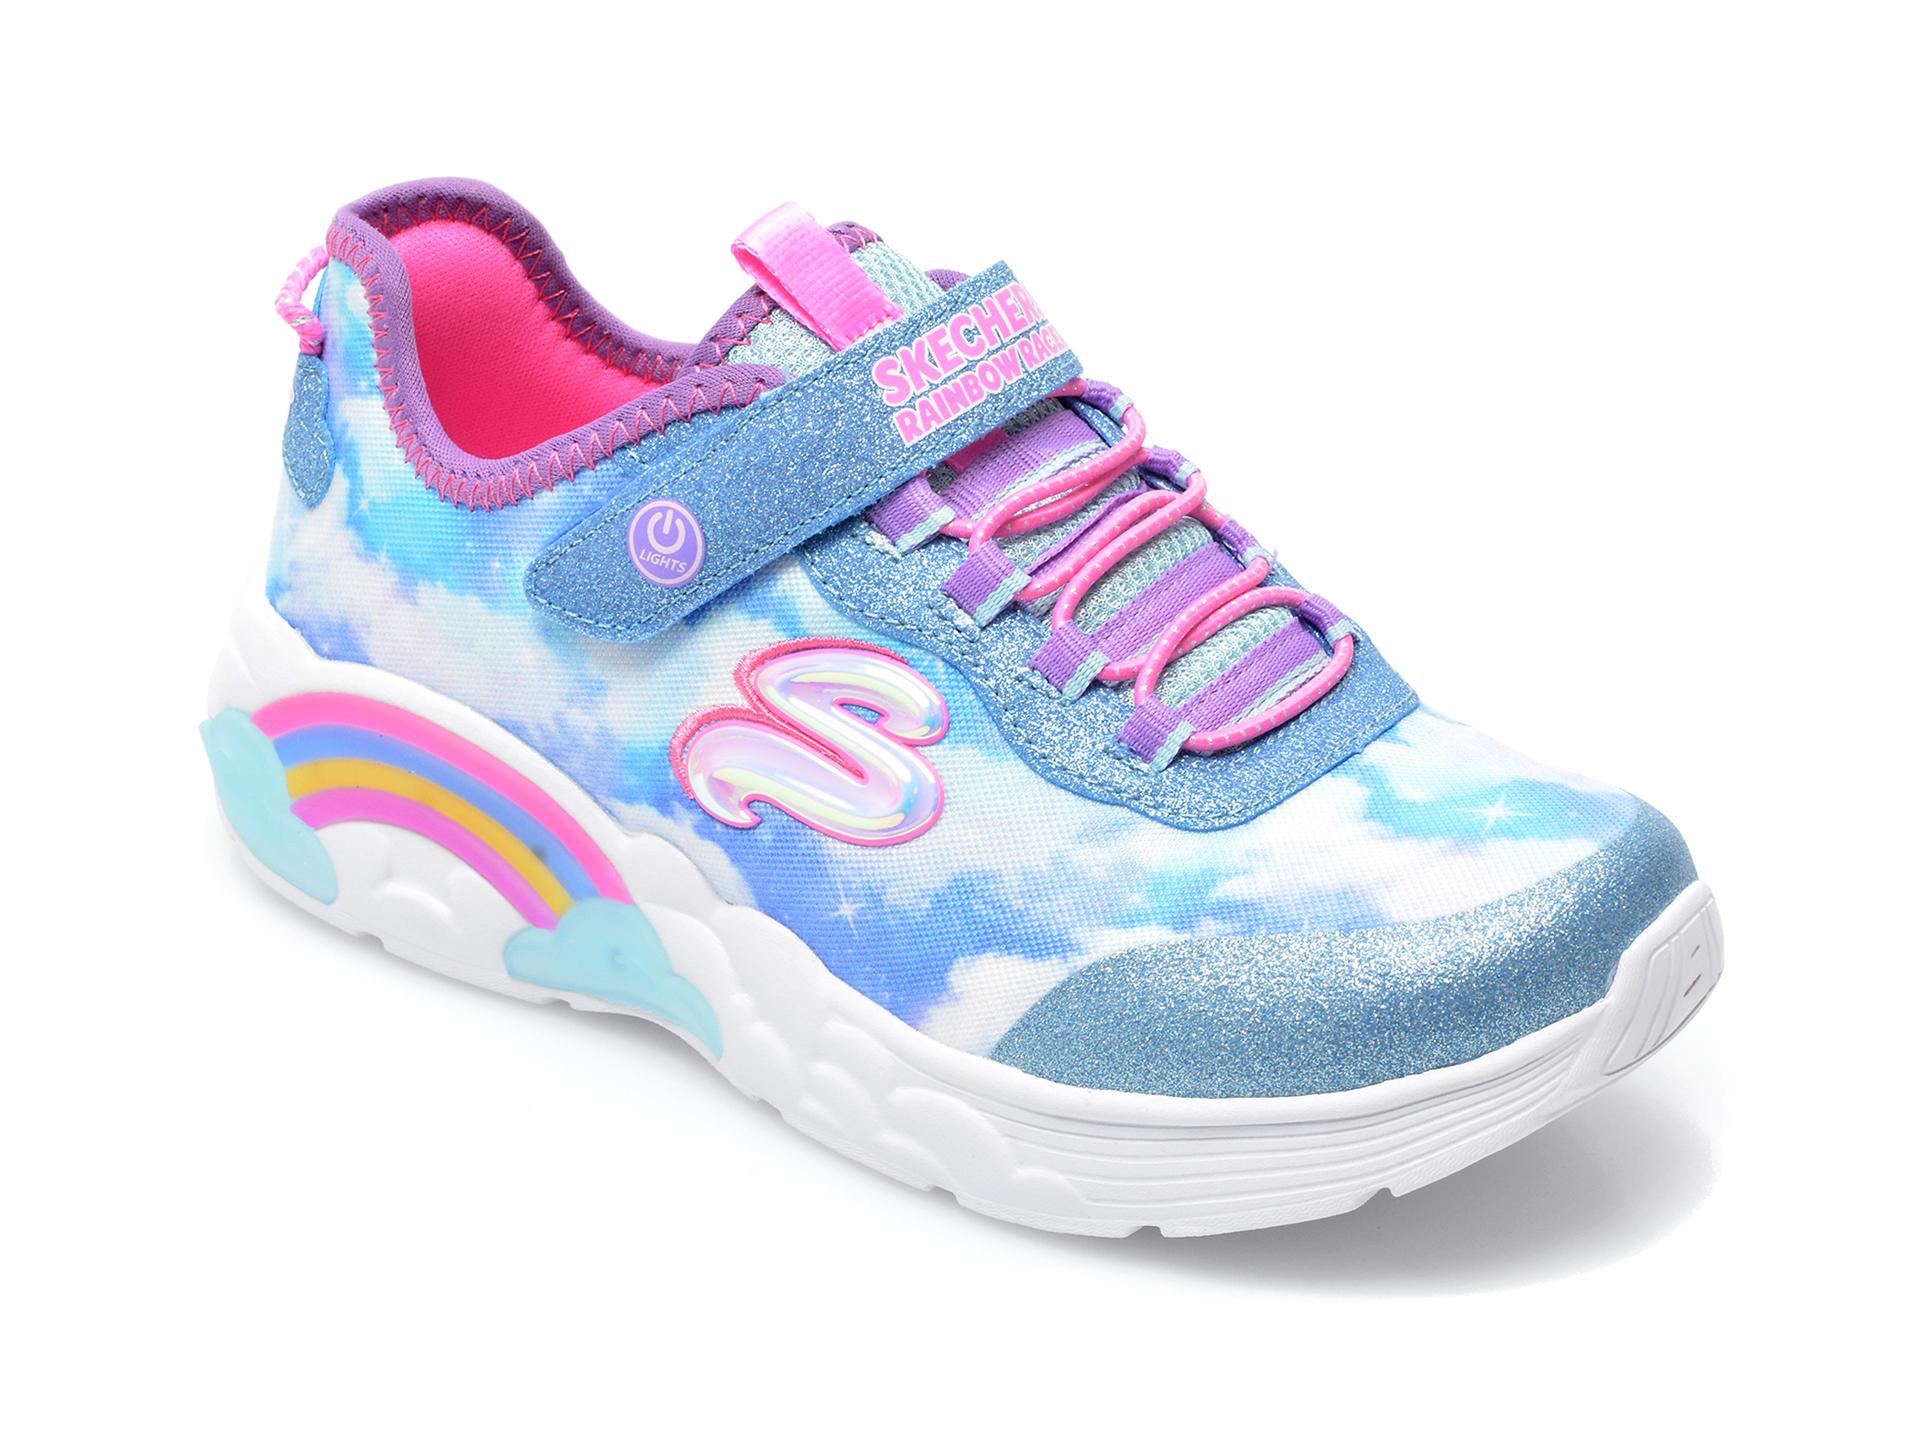 Pantofi sport SKECHERS albastri, RAINBOW RACER, din material textil